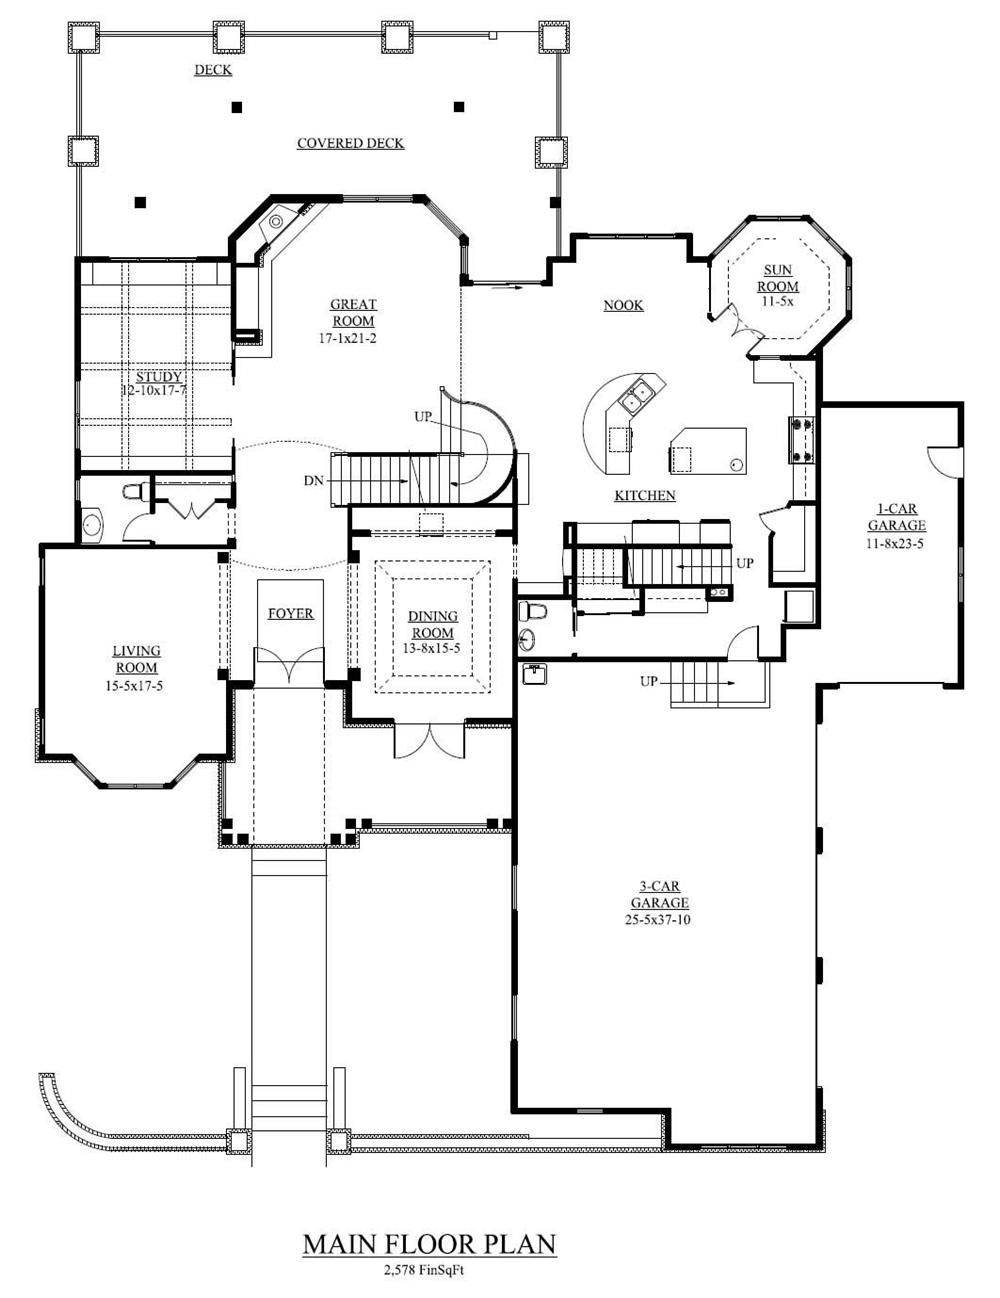 Floor Plan First Story Luxury Plan Floor Plans Shop House Plans